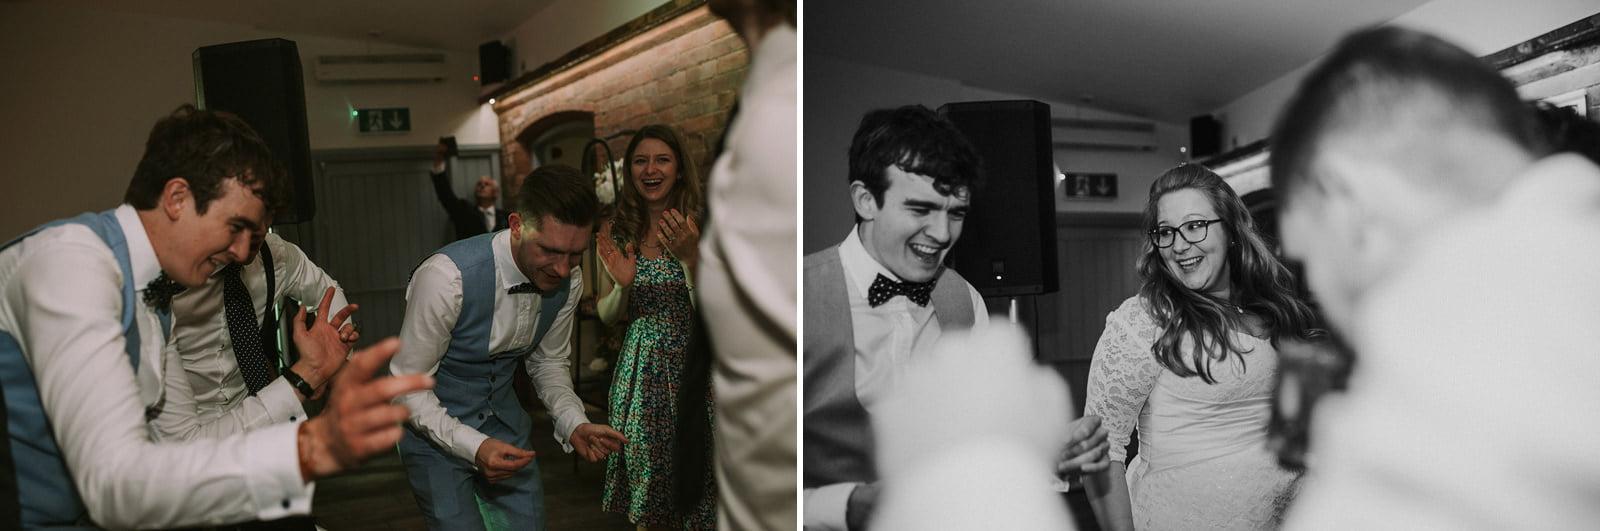 fun wedding photography warwickshire